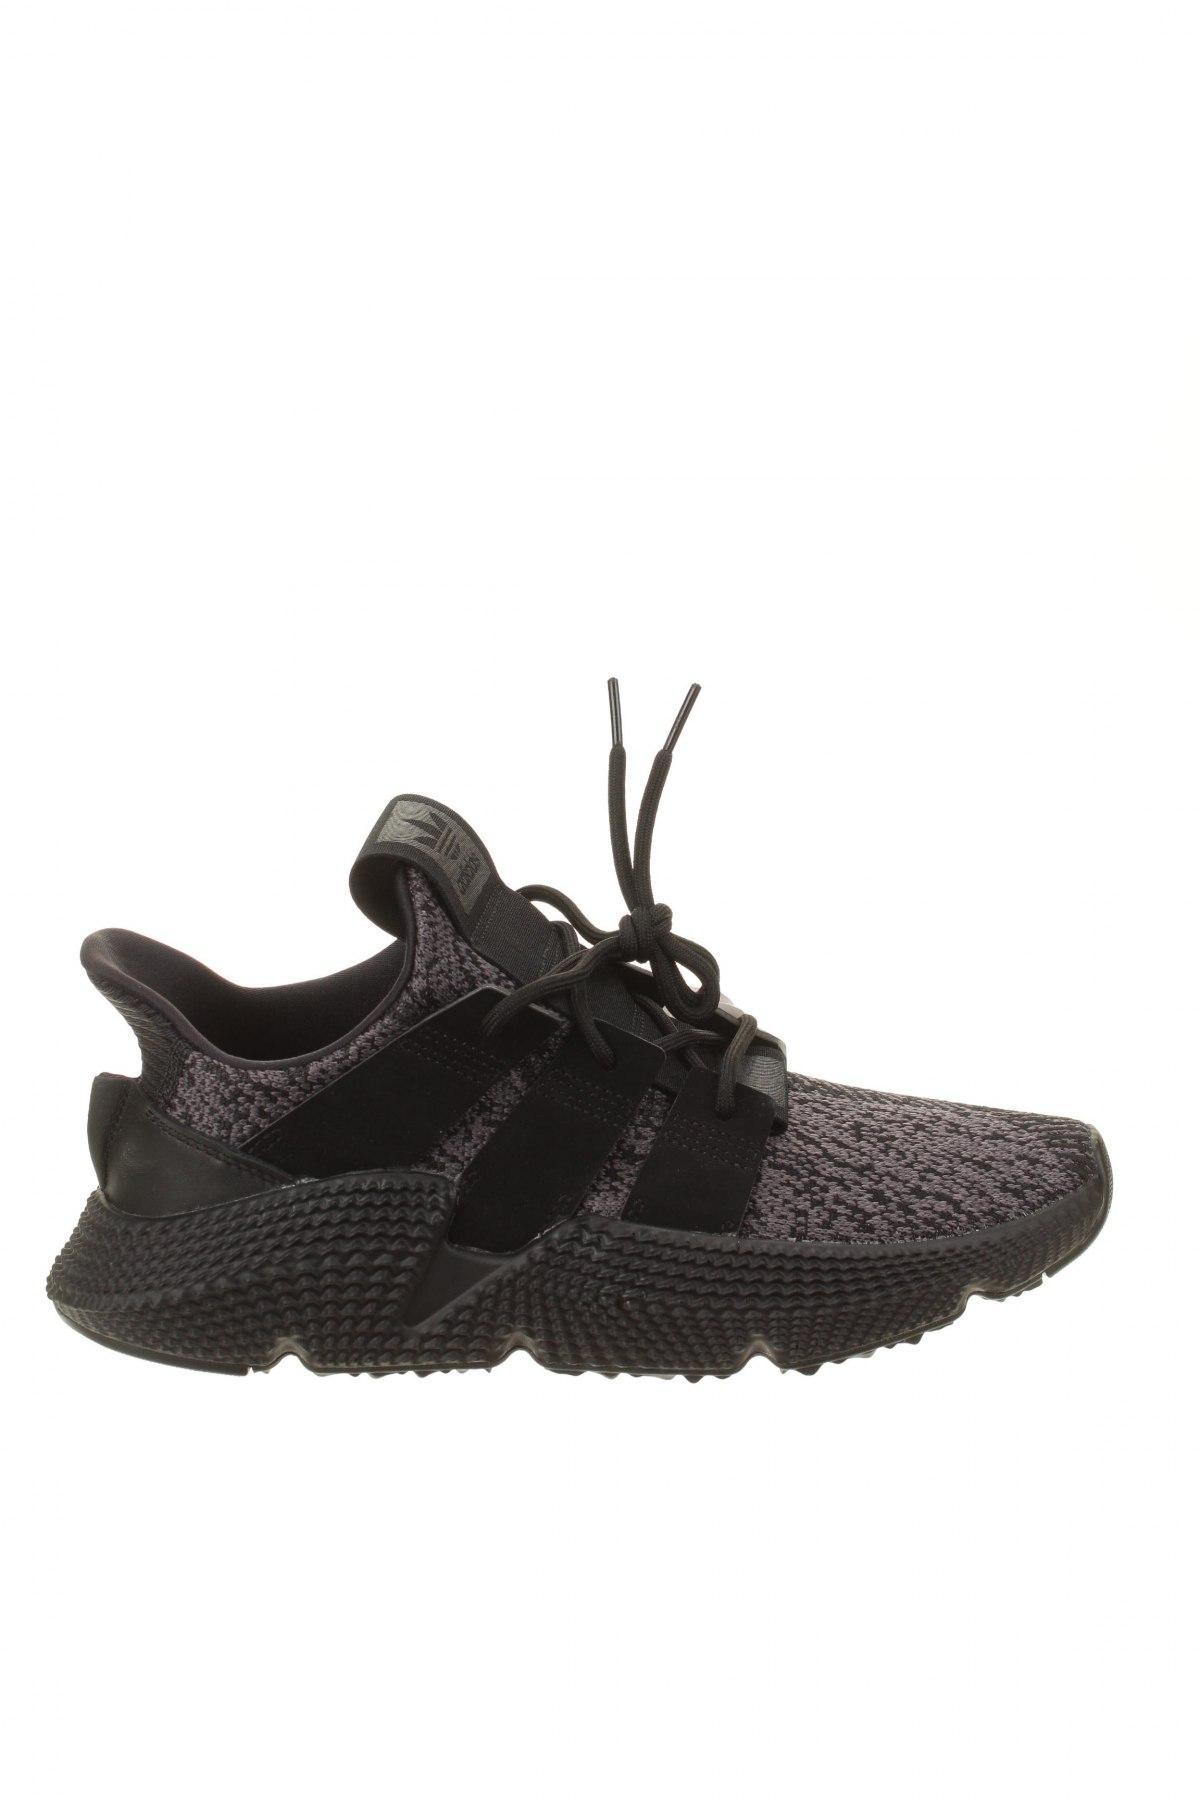 673f28f024840 Pánske topánky Adidas Originals - za výhodnú cenu na Remix - #103165232